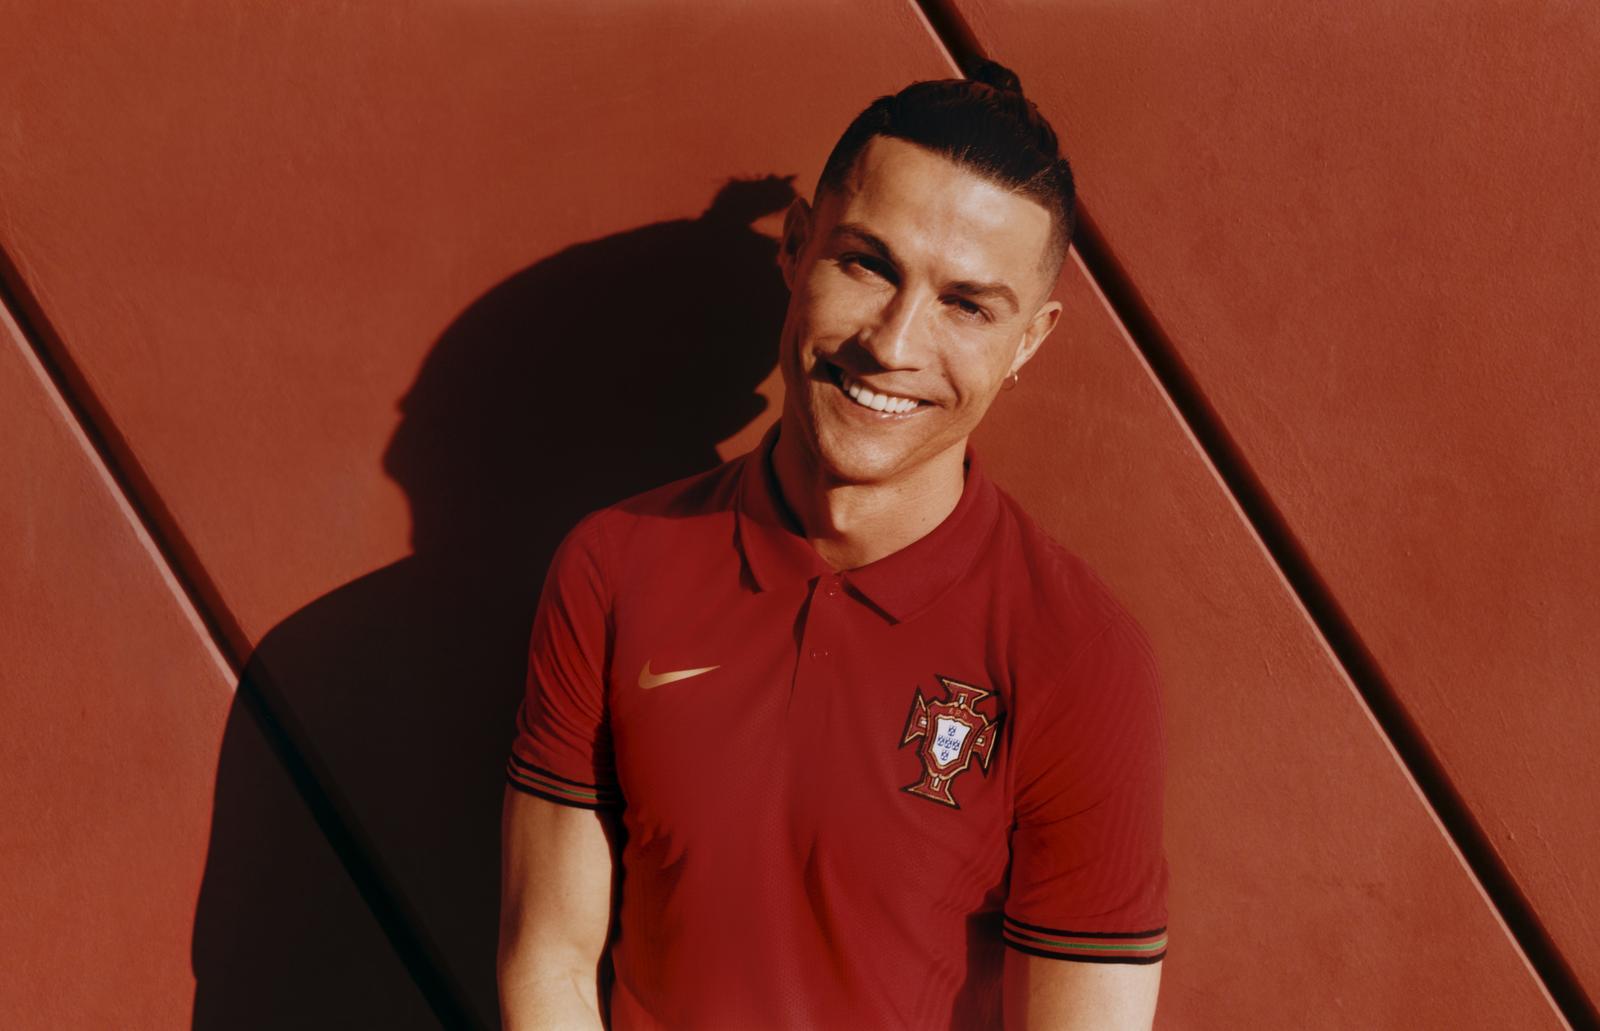 Nike 2020 Portugal National Team Kit 9